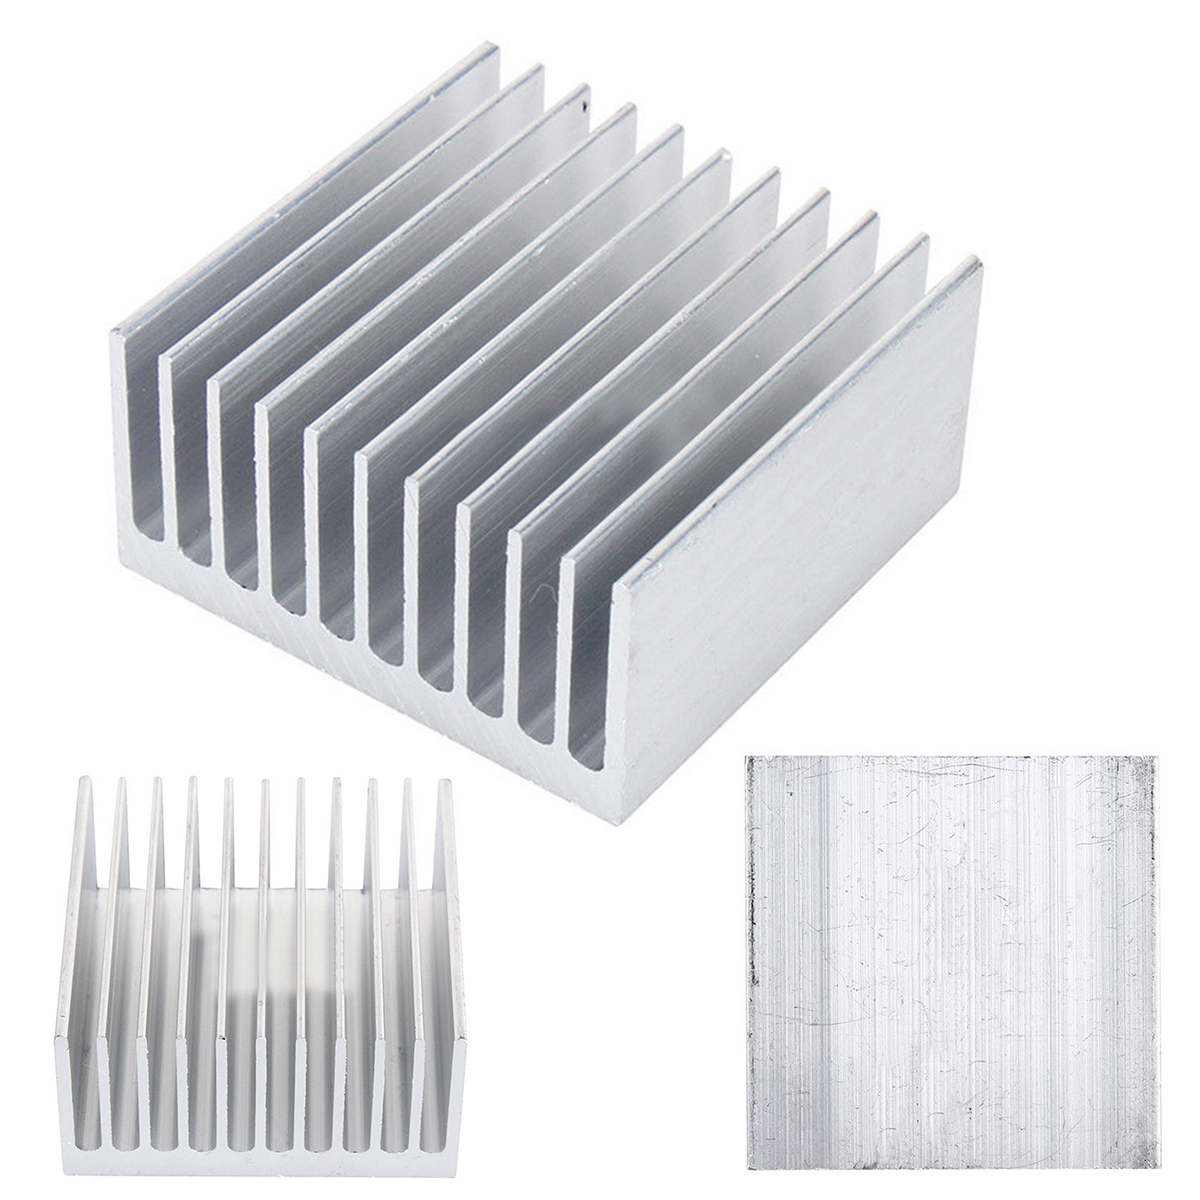 1 Piece New White 11 Tooth 40mm 40mm 20mm Aluminium Radiator Heatsink Heat Sink FGHGF